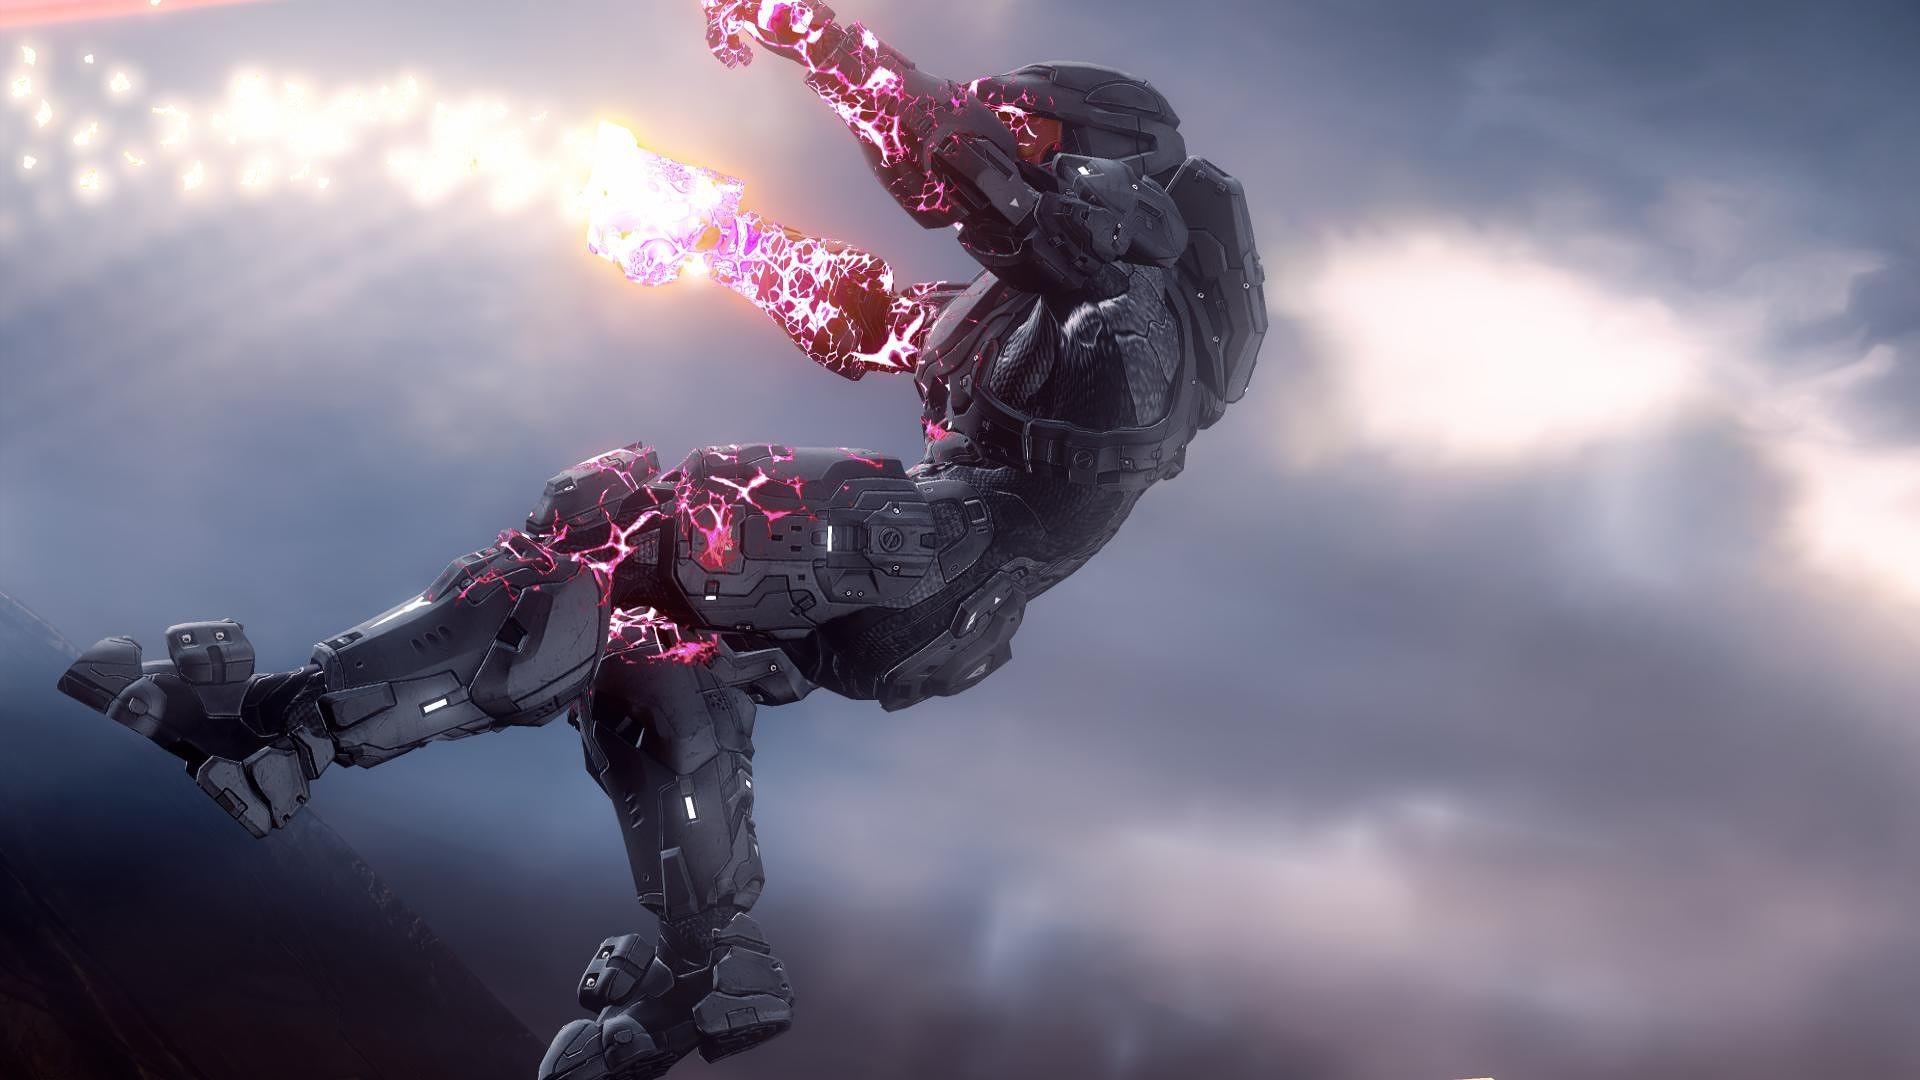 Halo 5 Master Chief Wallpaper Free HD 14162 – Amazing Wallpaperz